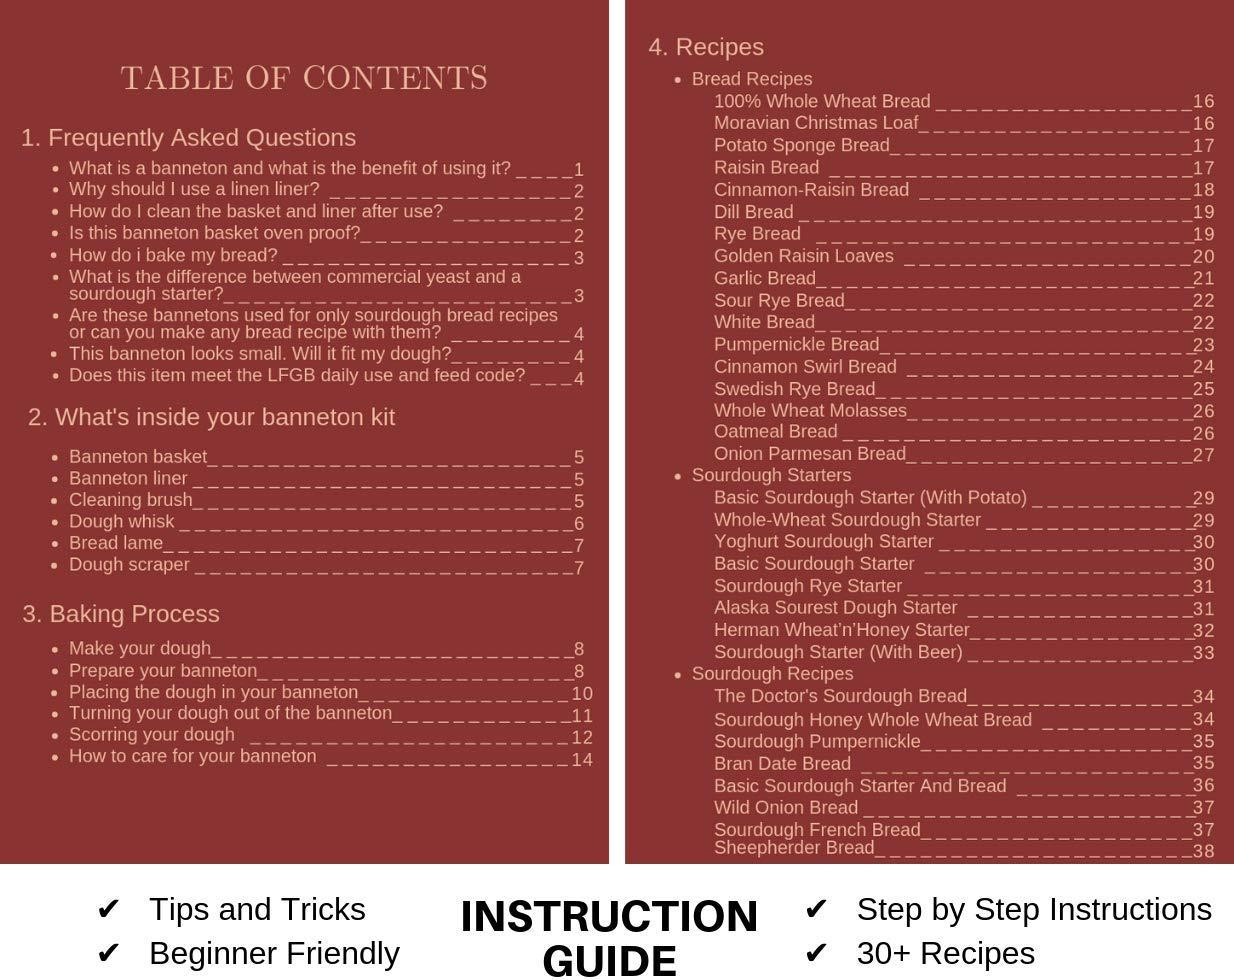 BreadBasics Banneton Proofing Basket   Premium Homemade Bread Starter Kit for Beginners   Includes Step by Step eBook, Bowl Scraper & Whisk, Lame, Brotform Liner, Cleaning Brush   Sourdough Supplies by BreadBasics (Image #6)